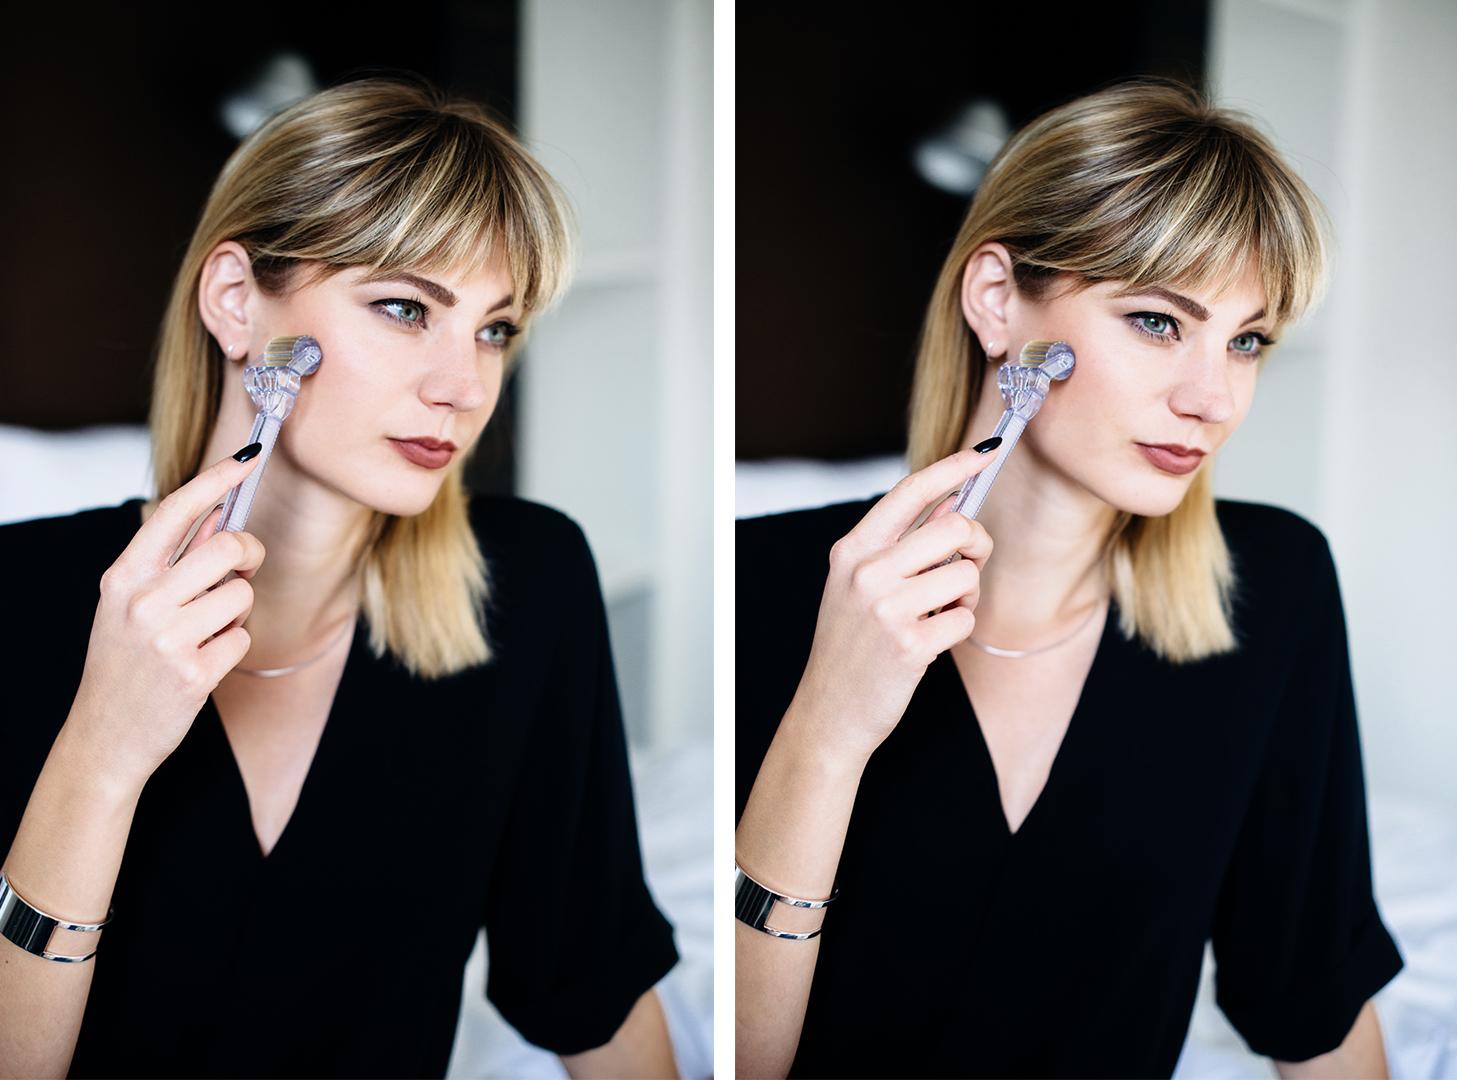 Kiamisu_Modeblog_Fashionblog_Beautyblog_WhiteLotus_White Lotus Dermaroller_Test_Erfahrung-final_3